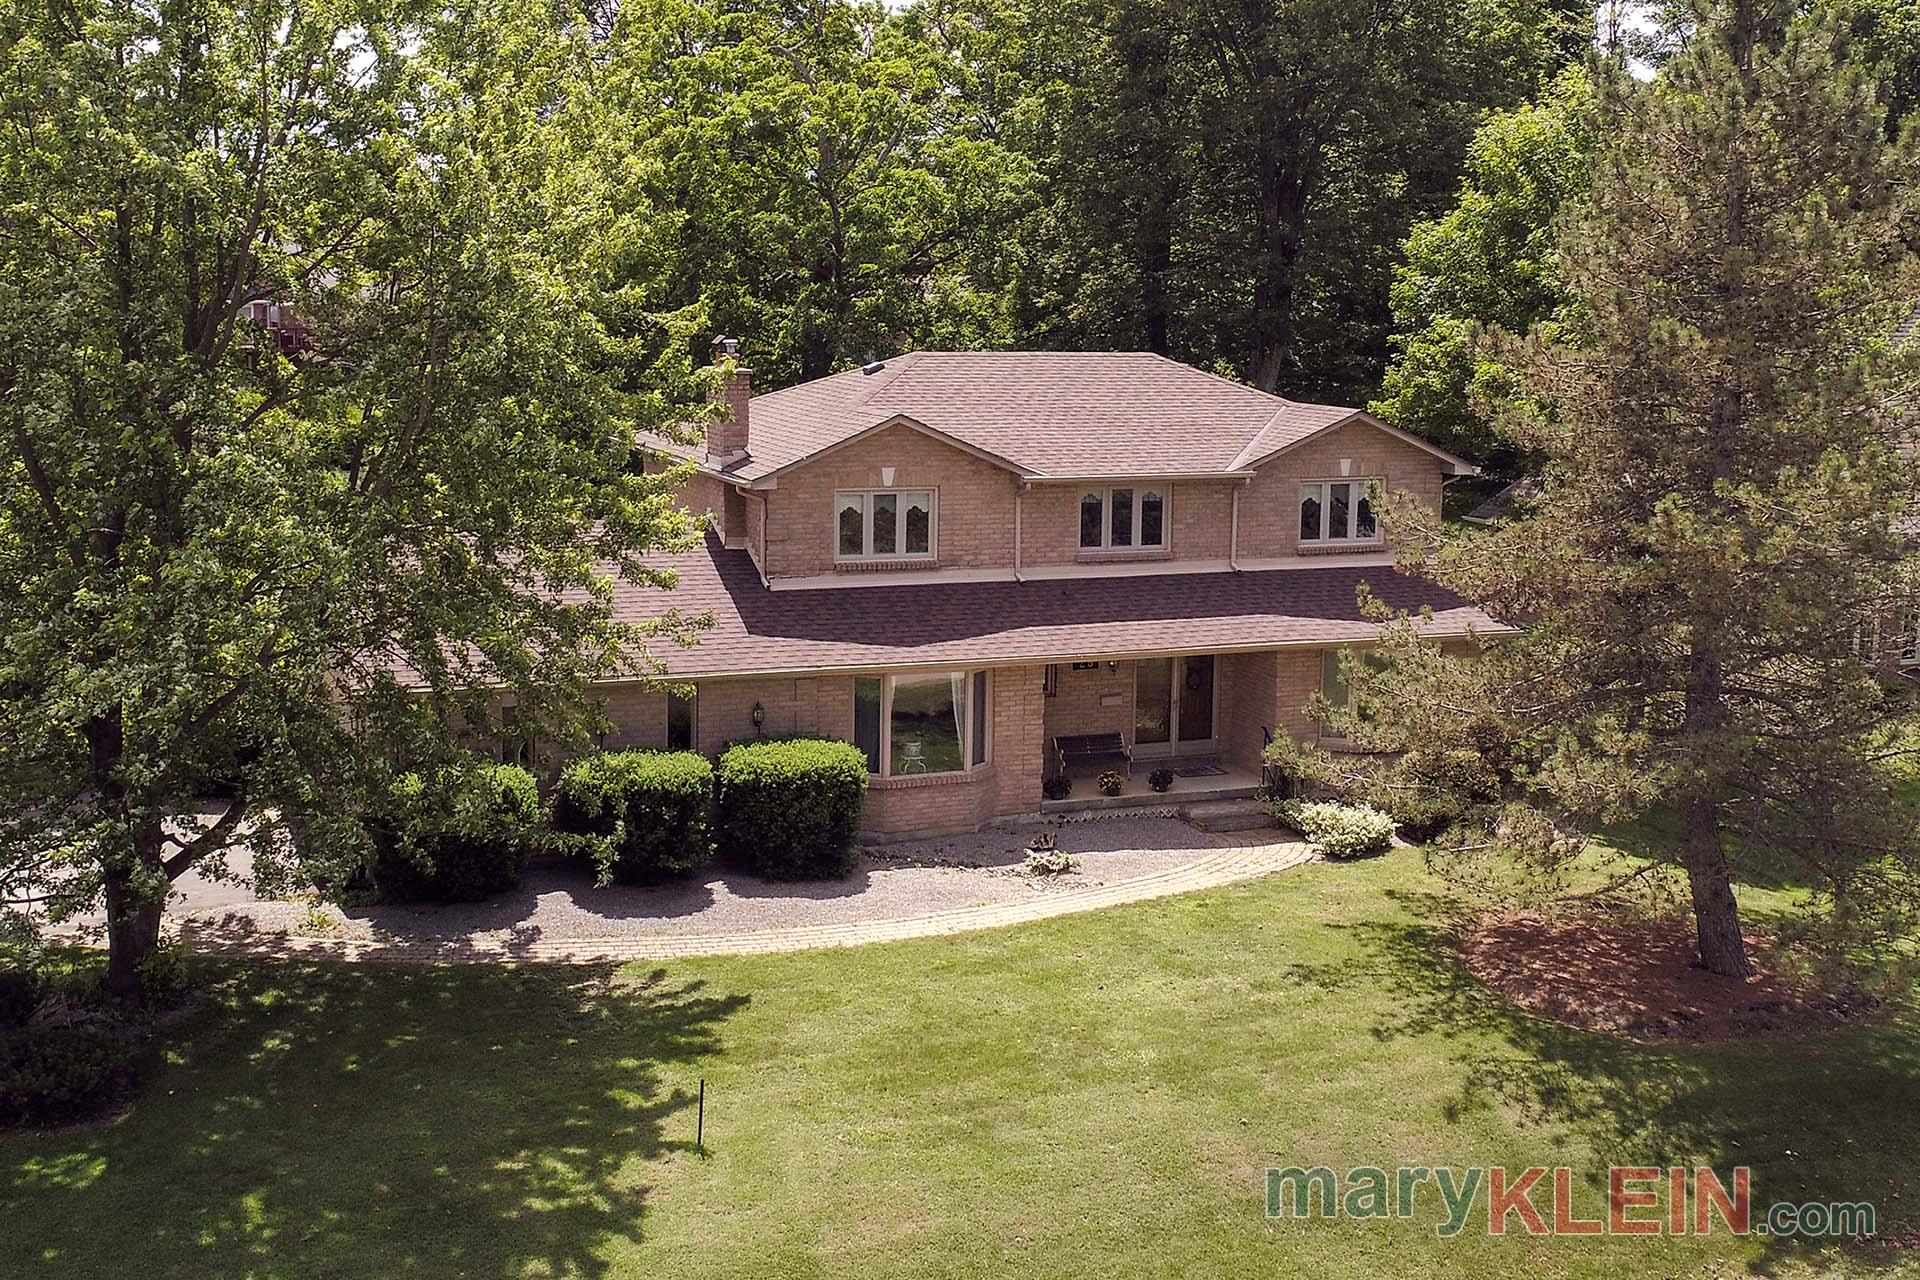 4 Bedroom Home for Sale, Mono, Ontario